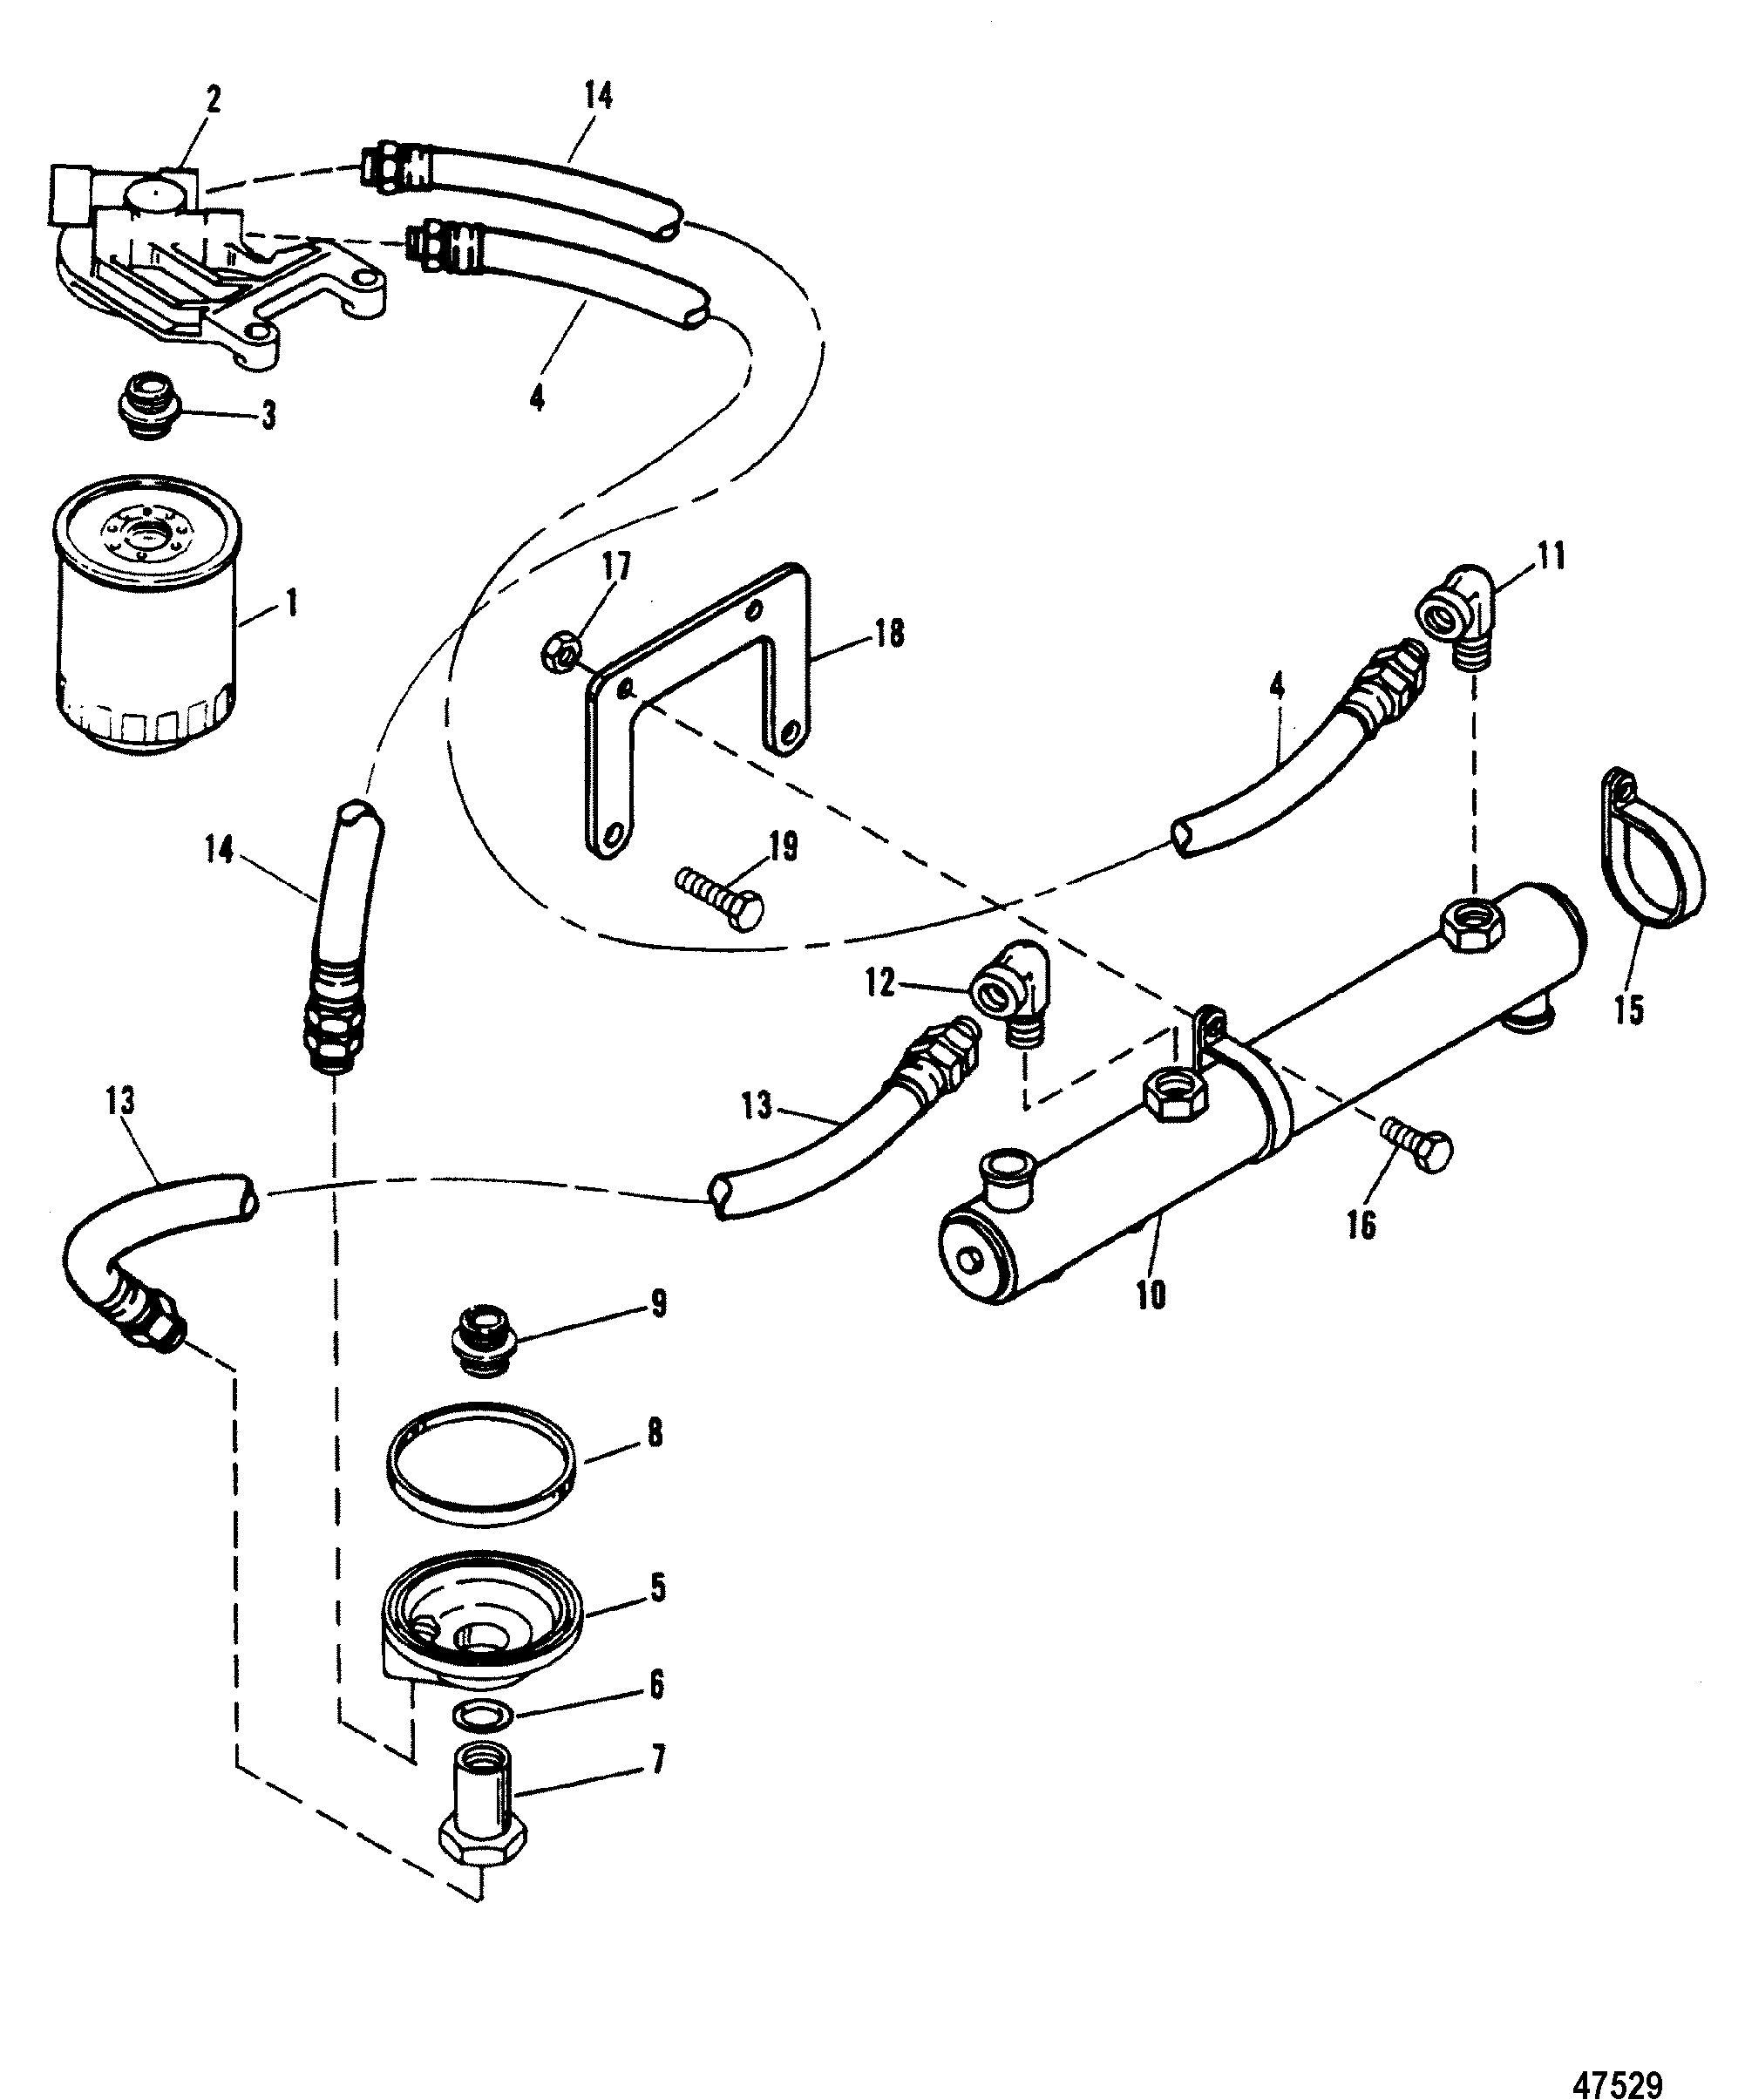 Oil Filter And Adaptor For Mercruiser 502 Magnum Bravo